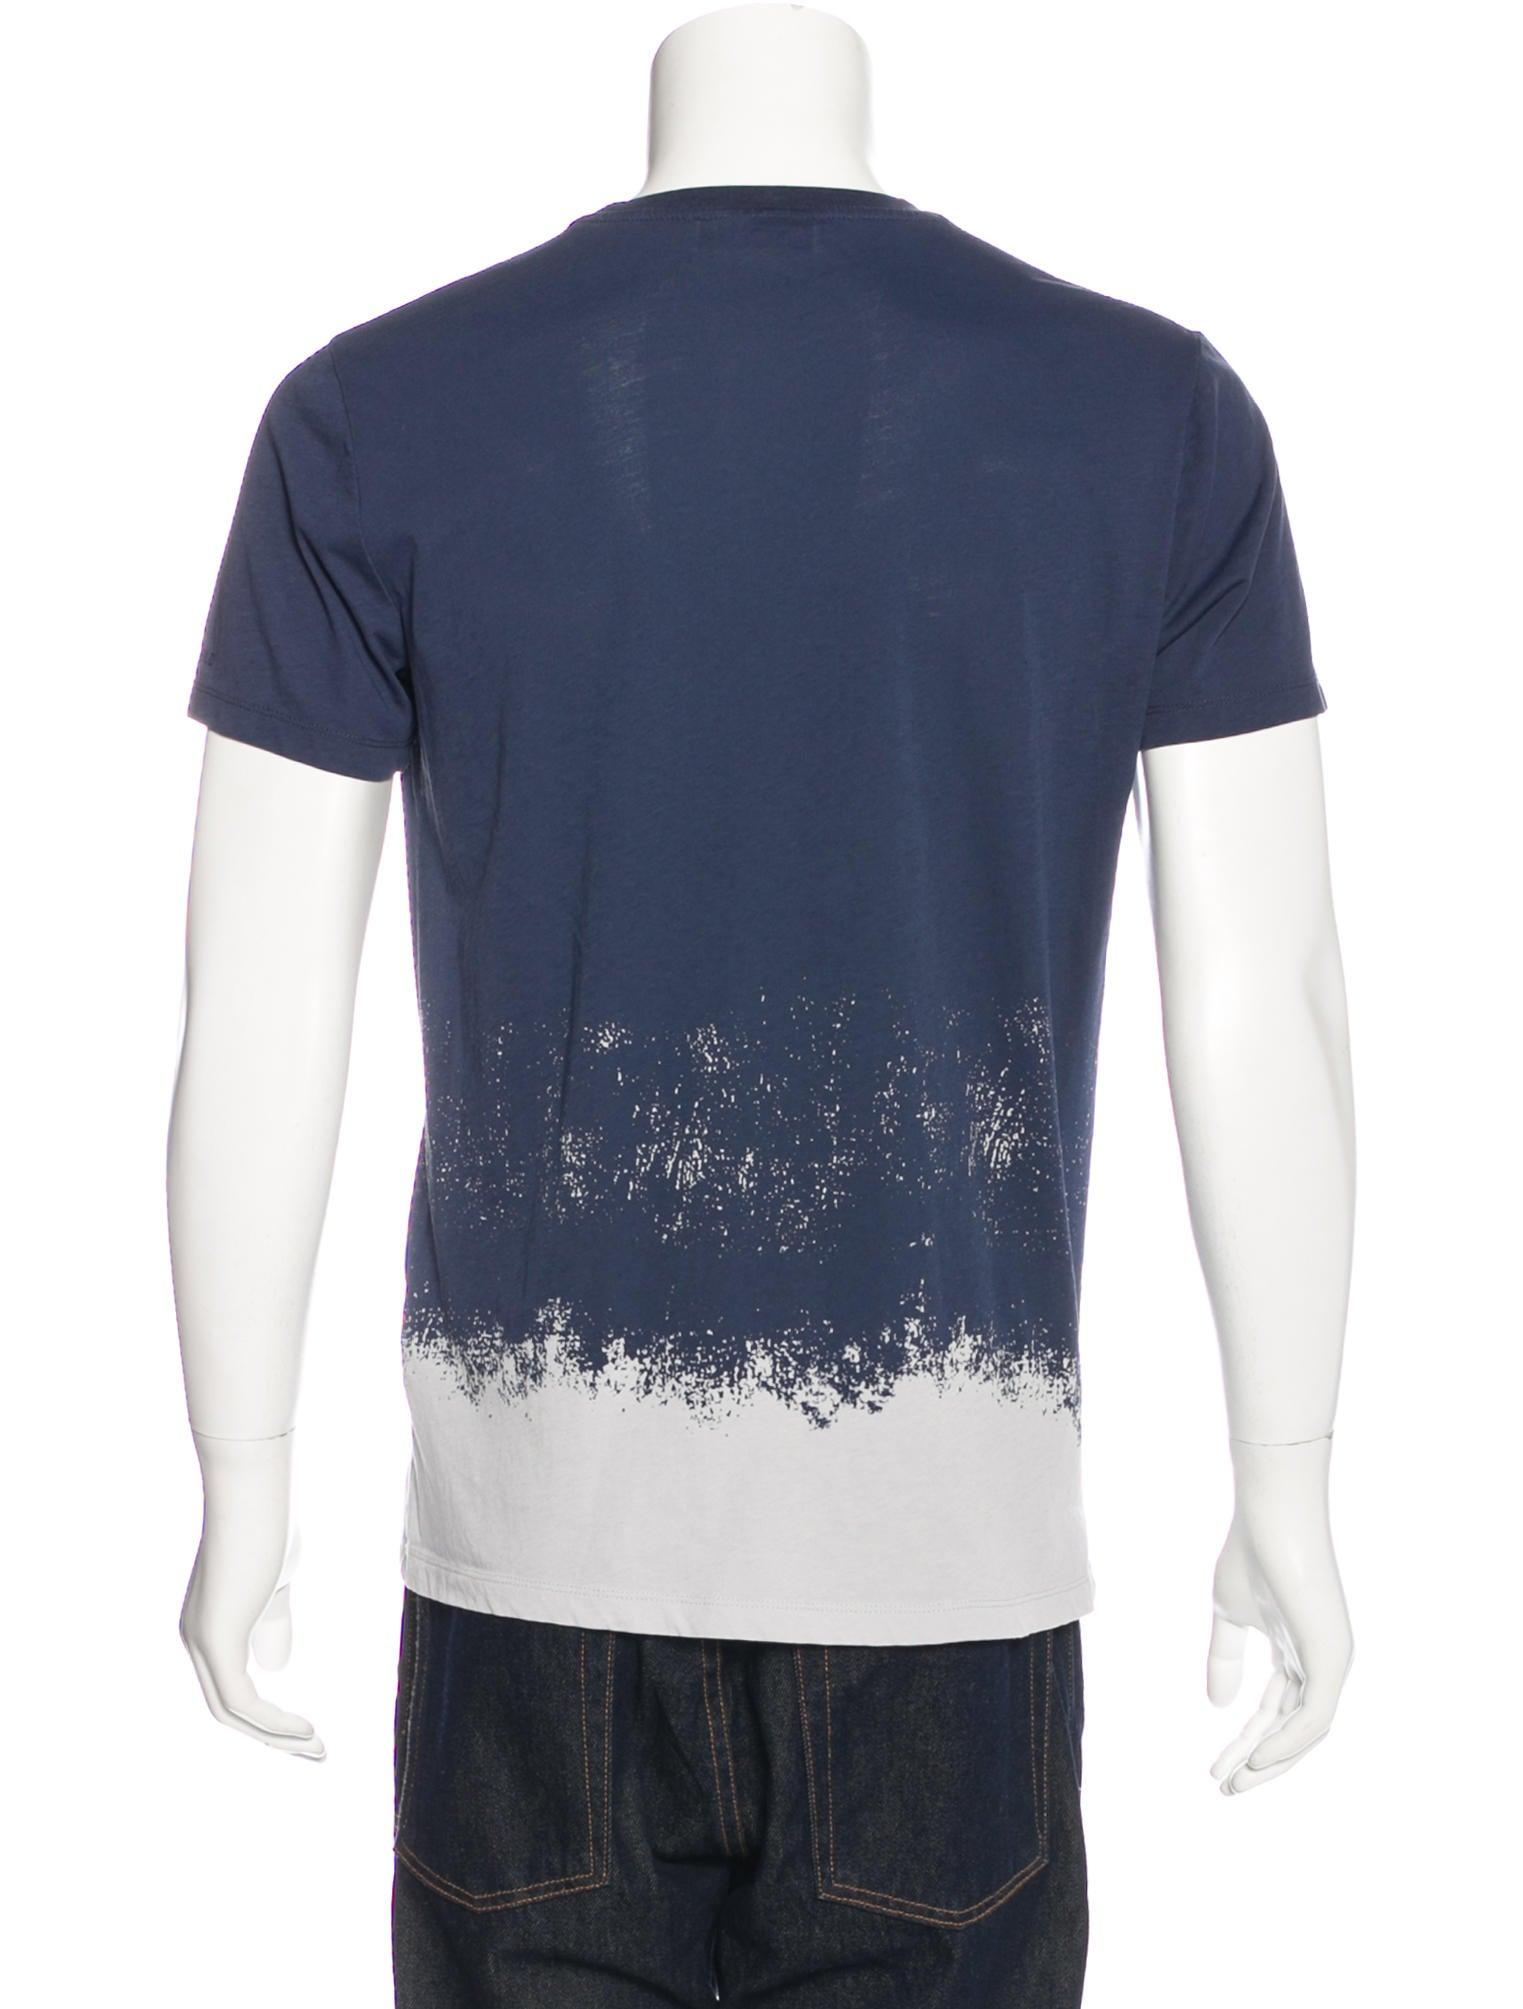 Lagerfeld dip dye print shirt clothing wla20035 the for Mens dip dye shirt